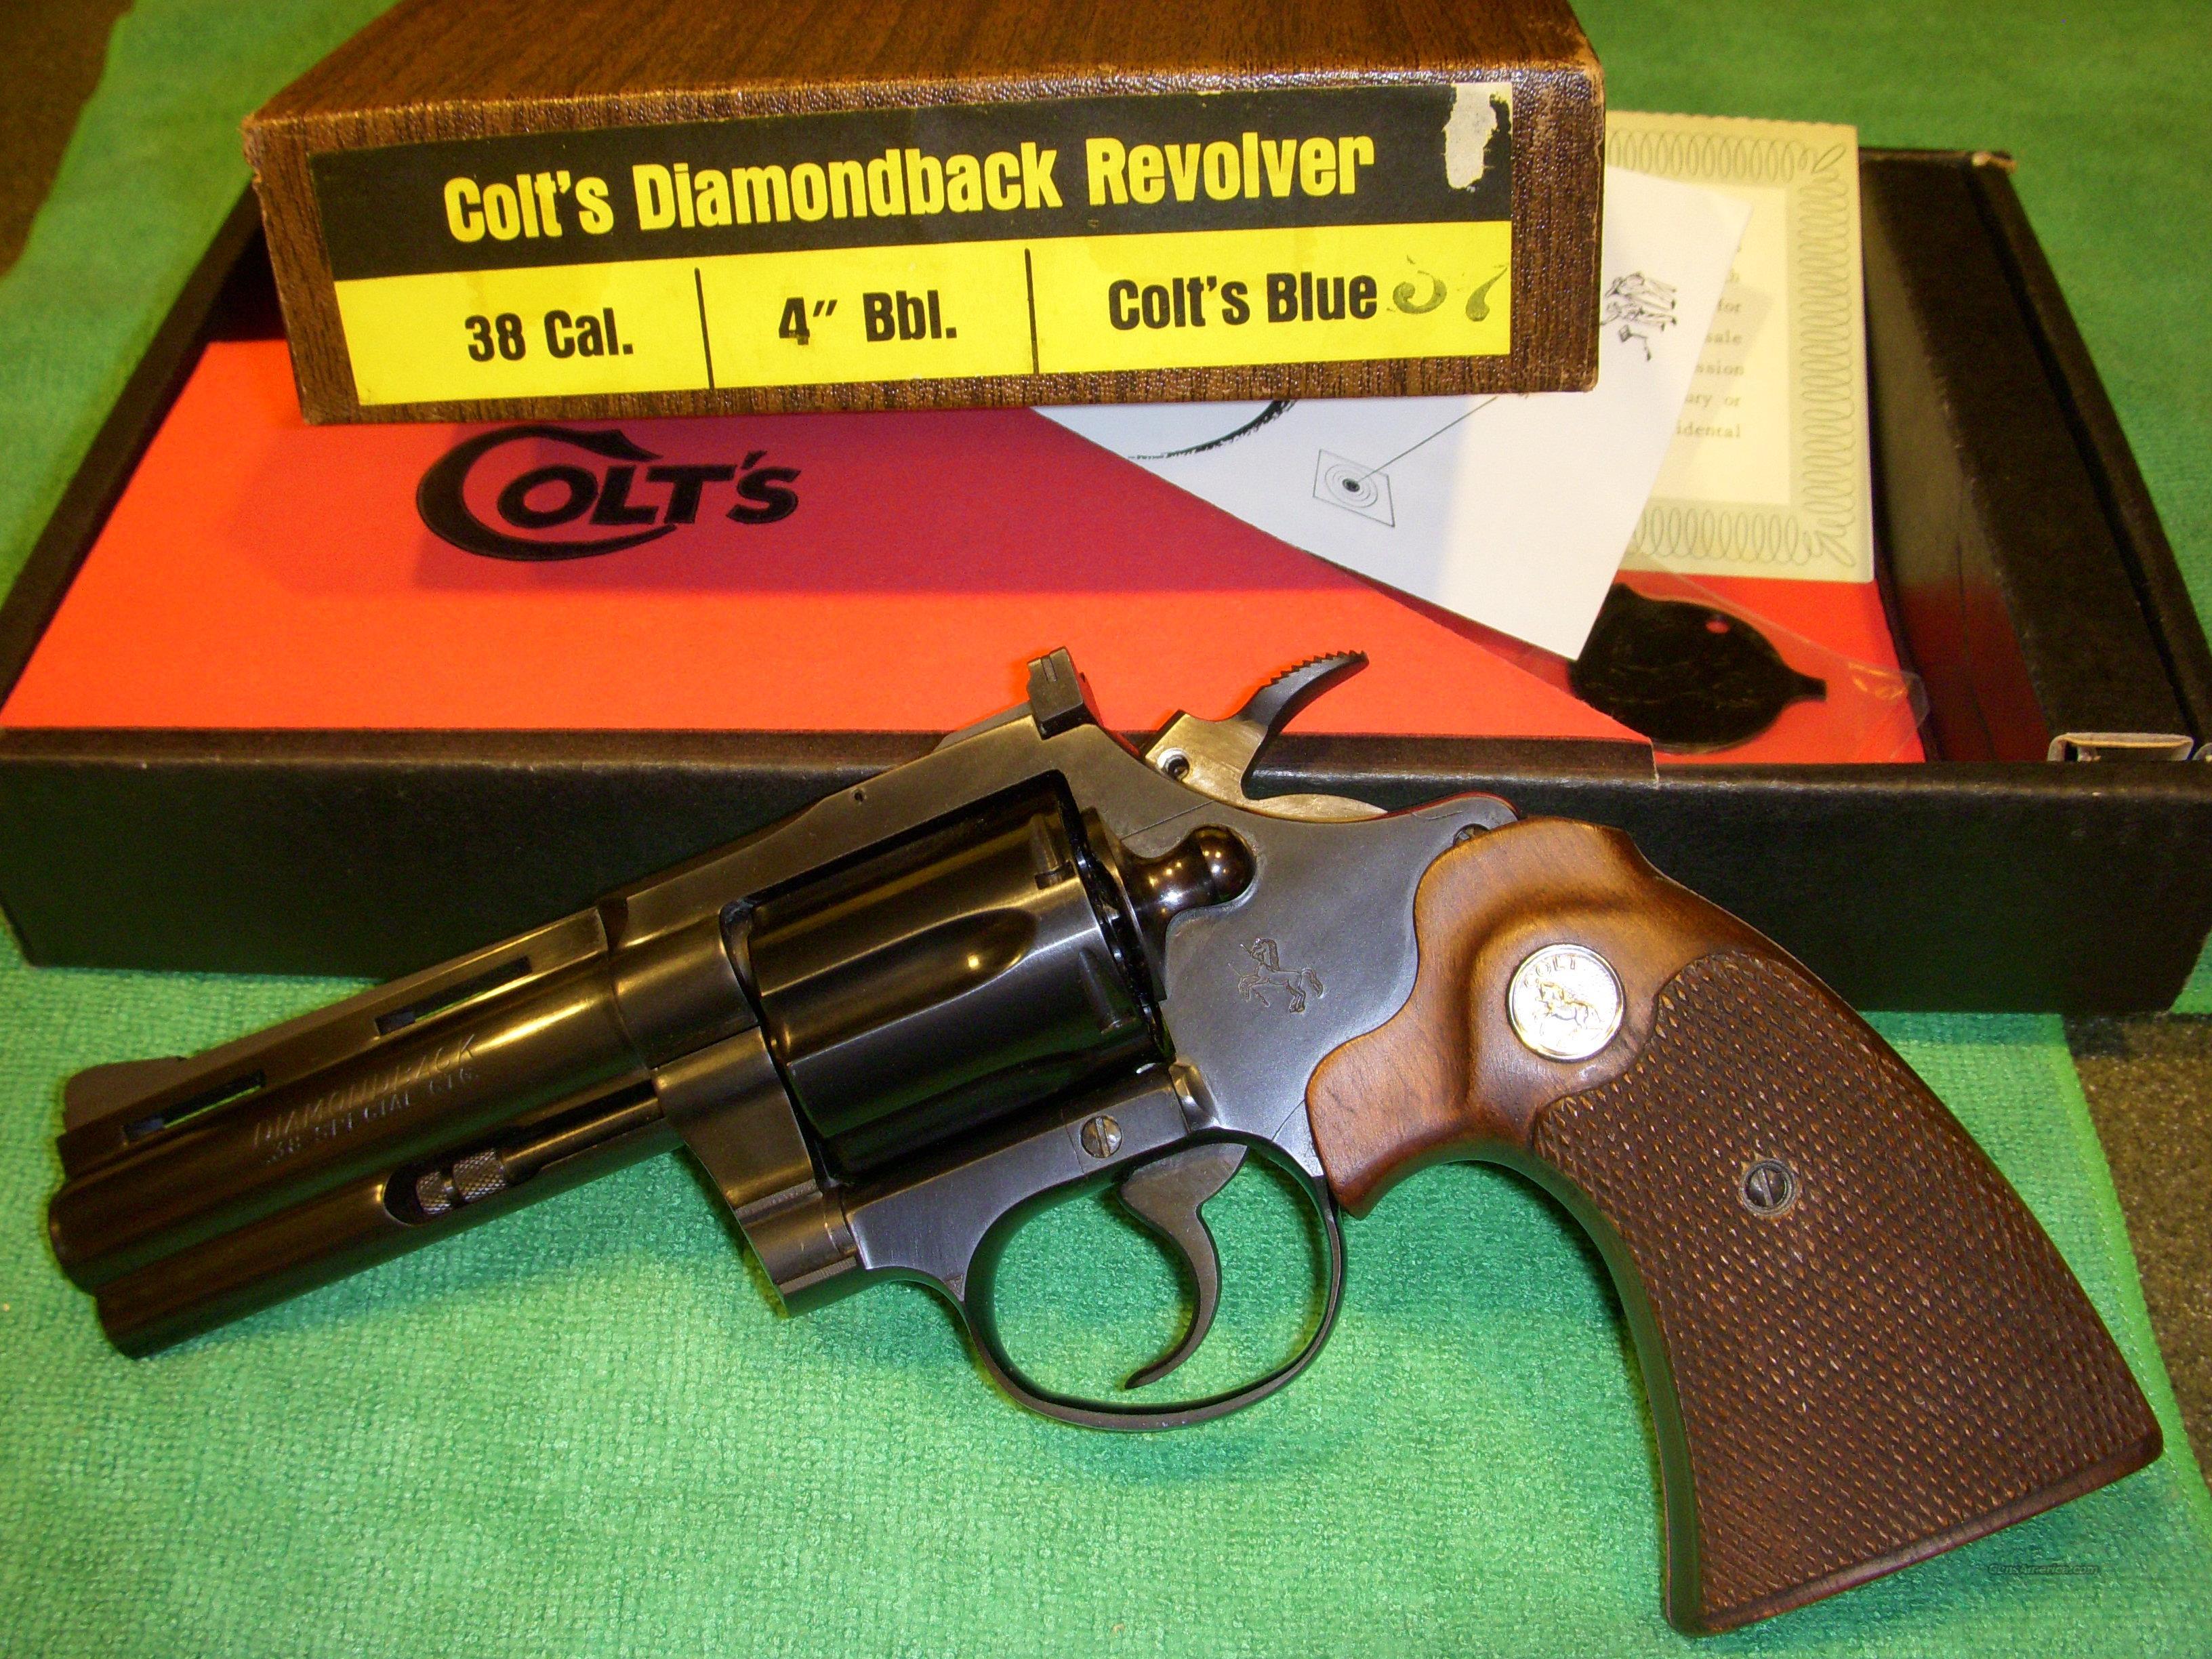 "Collectors,  Colt Diamondback 4"" Blue 38 Cal. Unfired/Scarce  Guns > Pistols > Colt Double Action Revolvers- Modern"